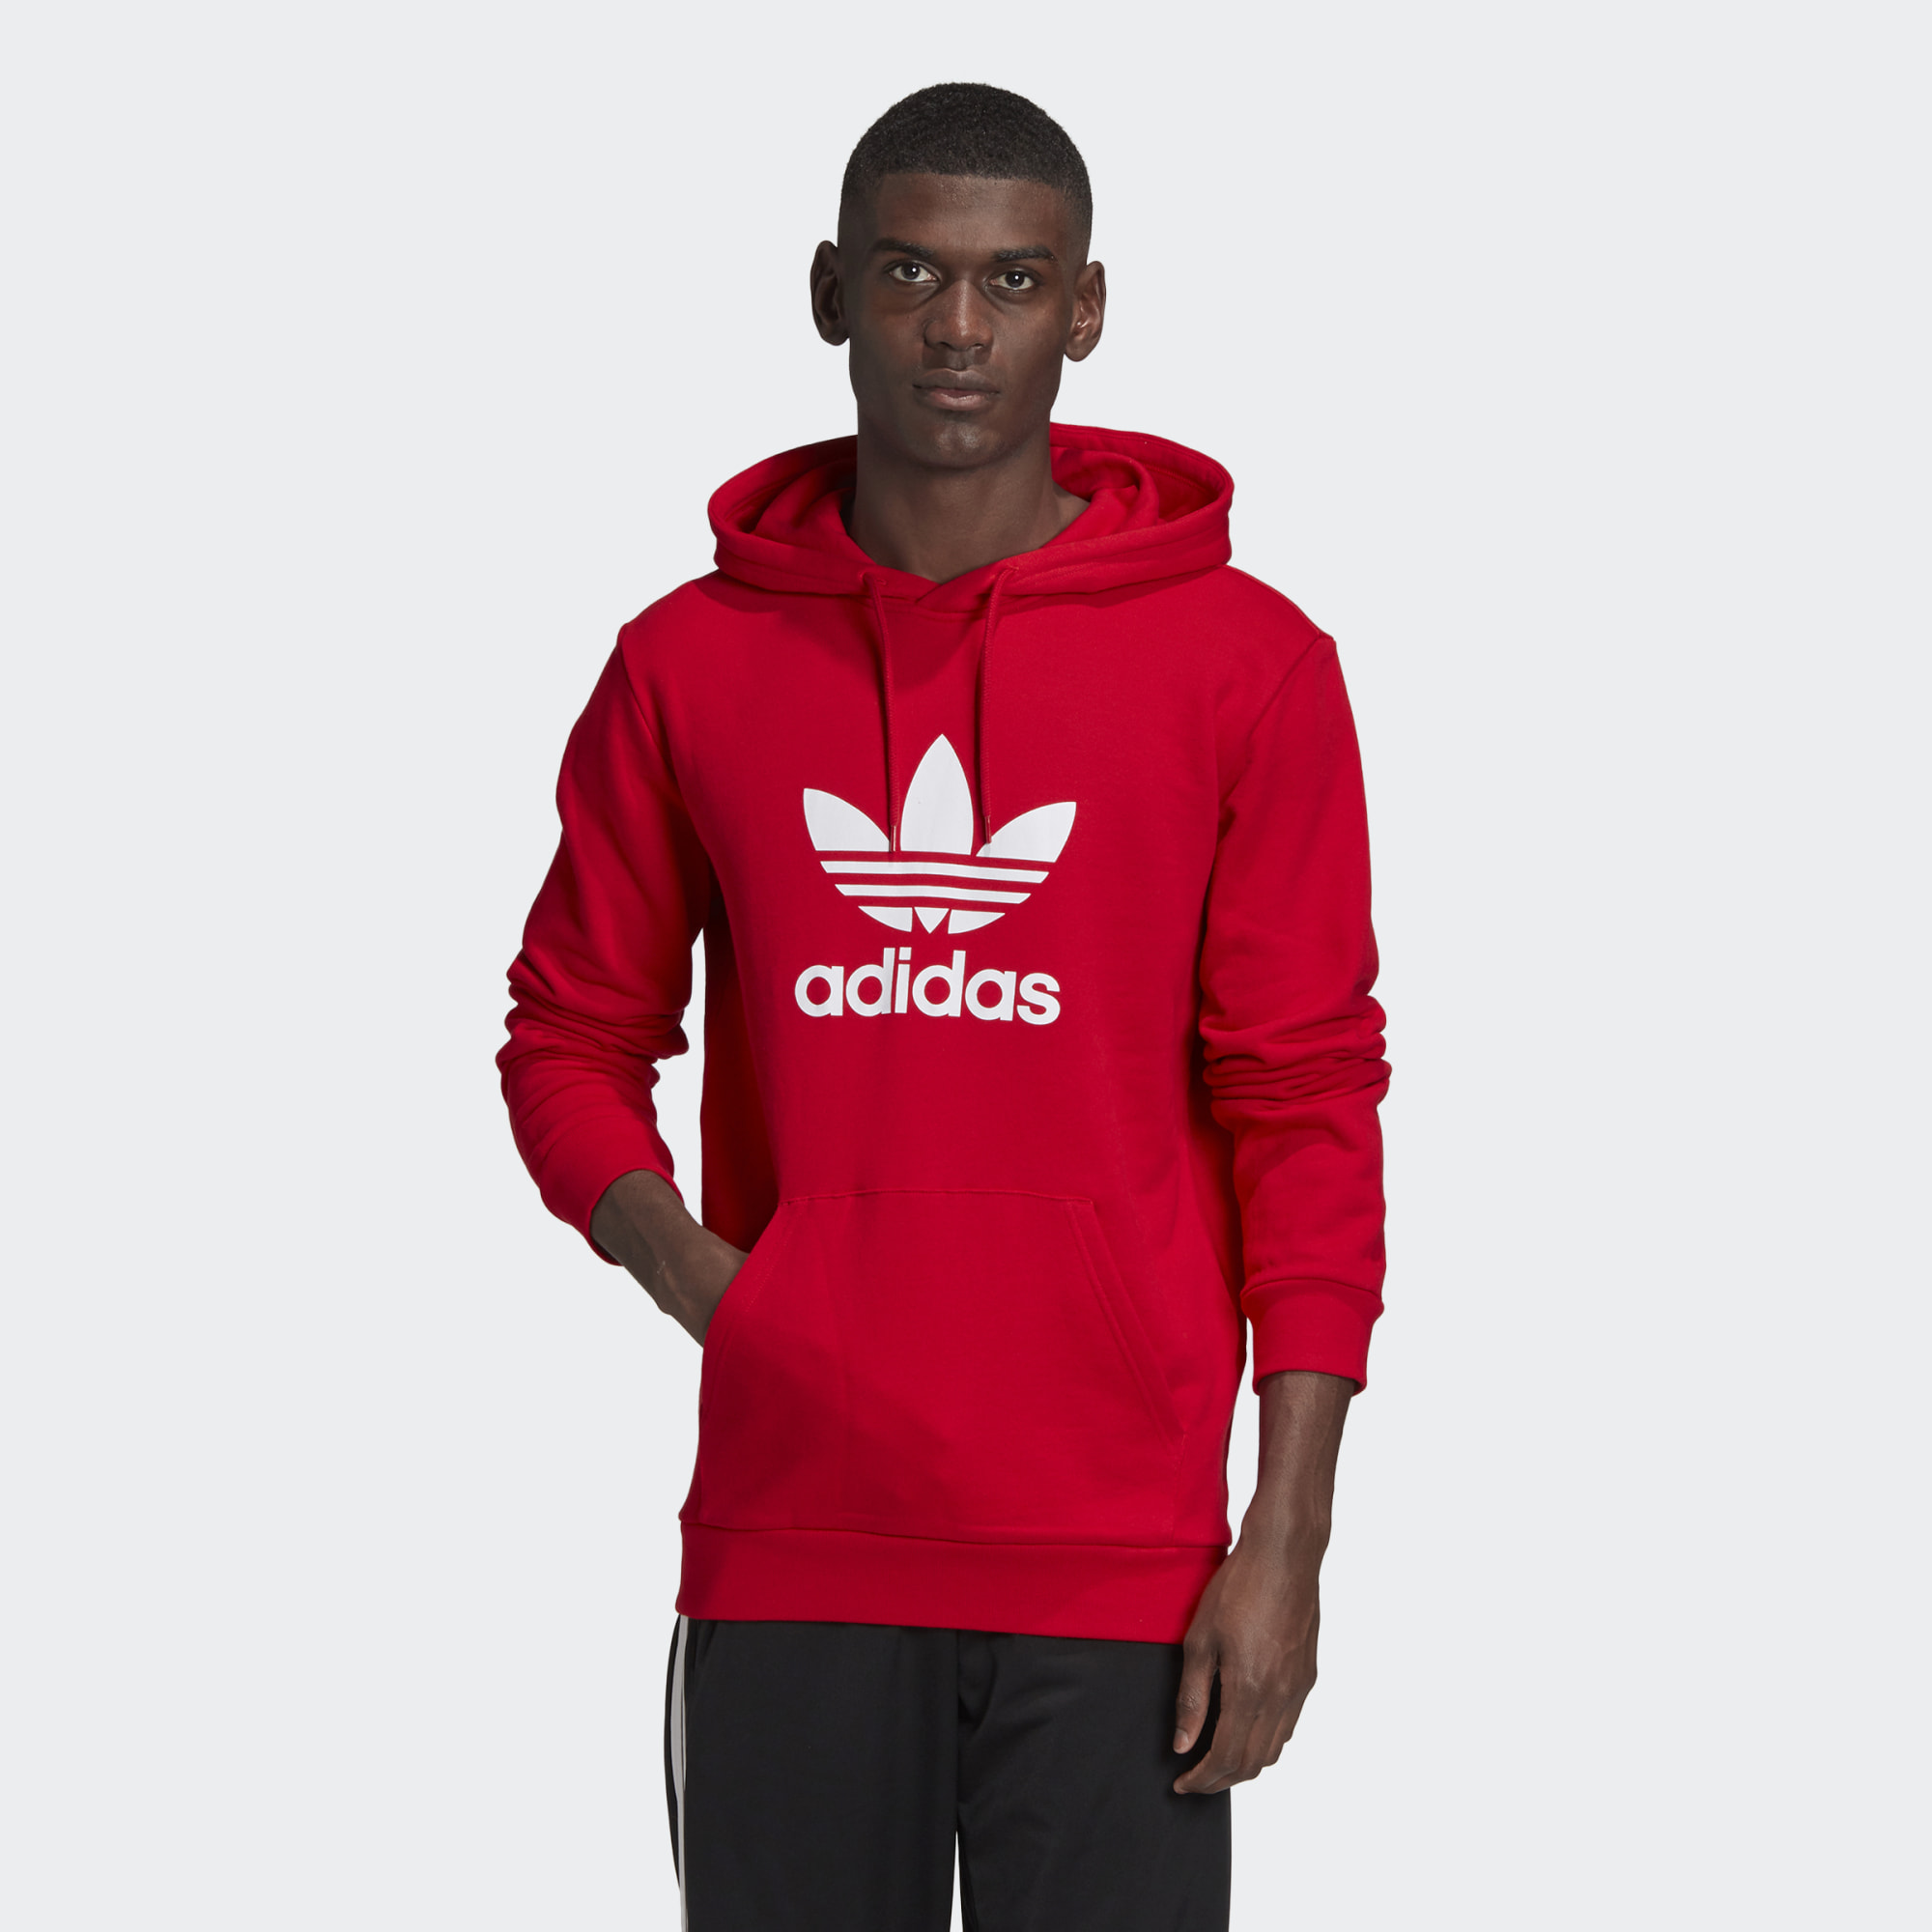 Adidas mikina Originals Trefoil Hoodie red Velikost: L